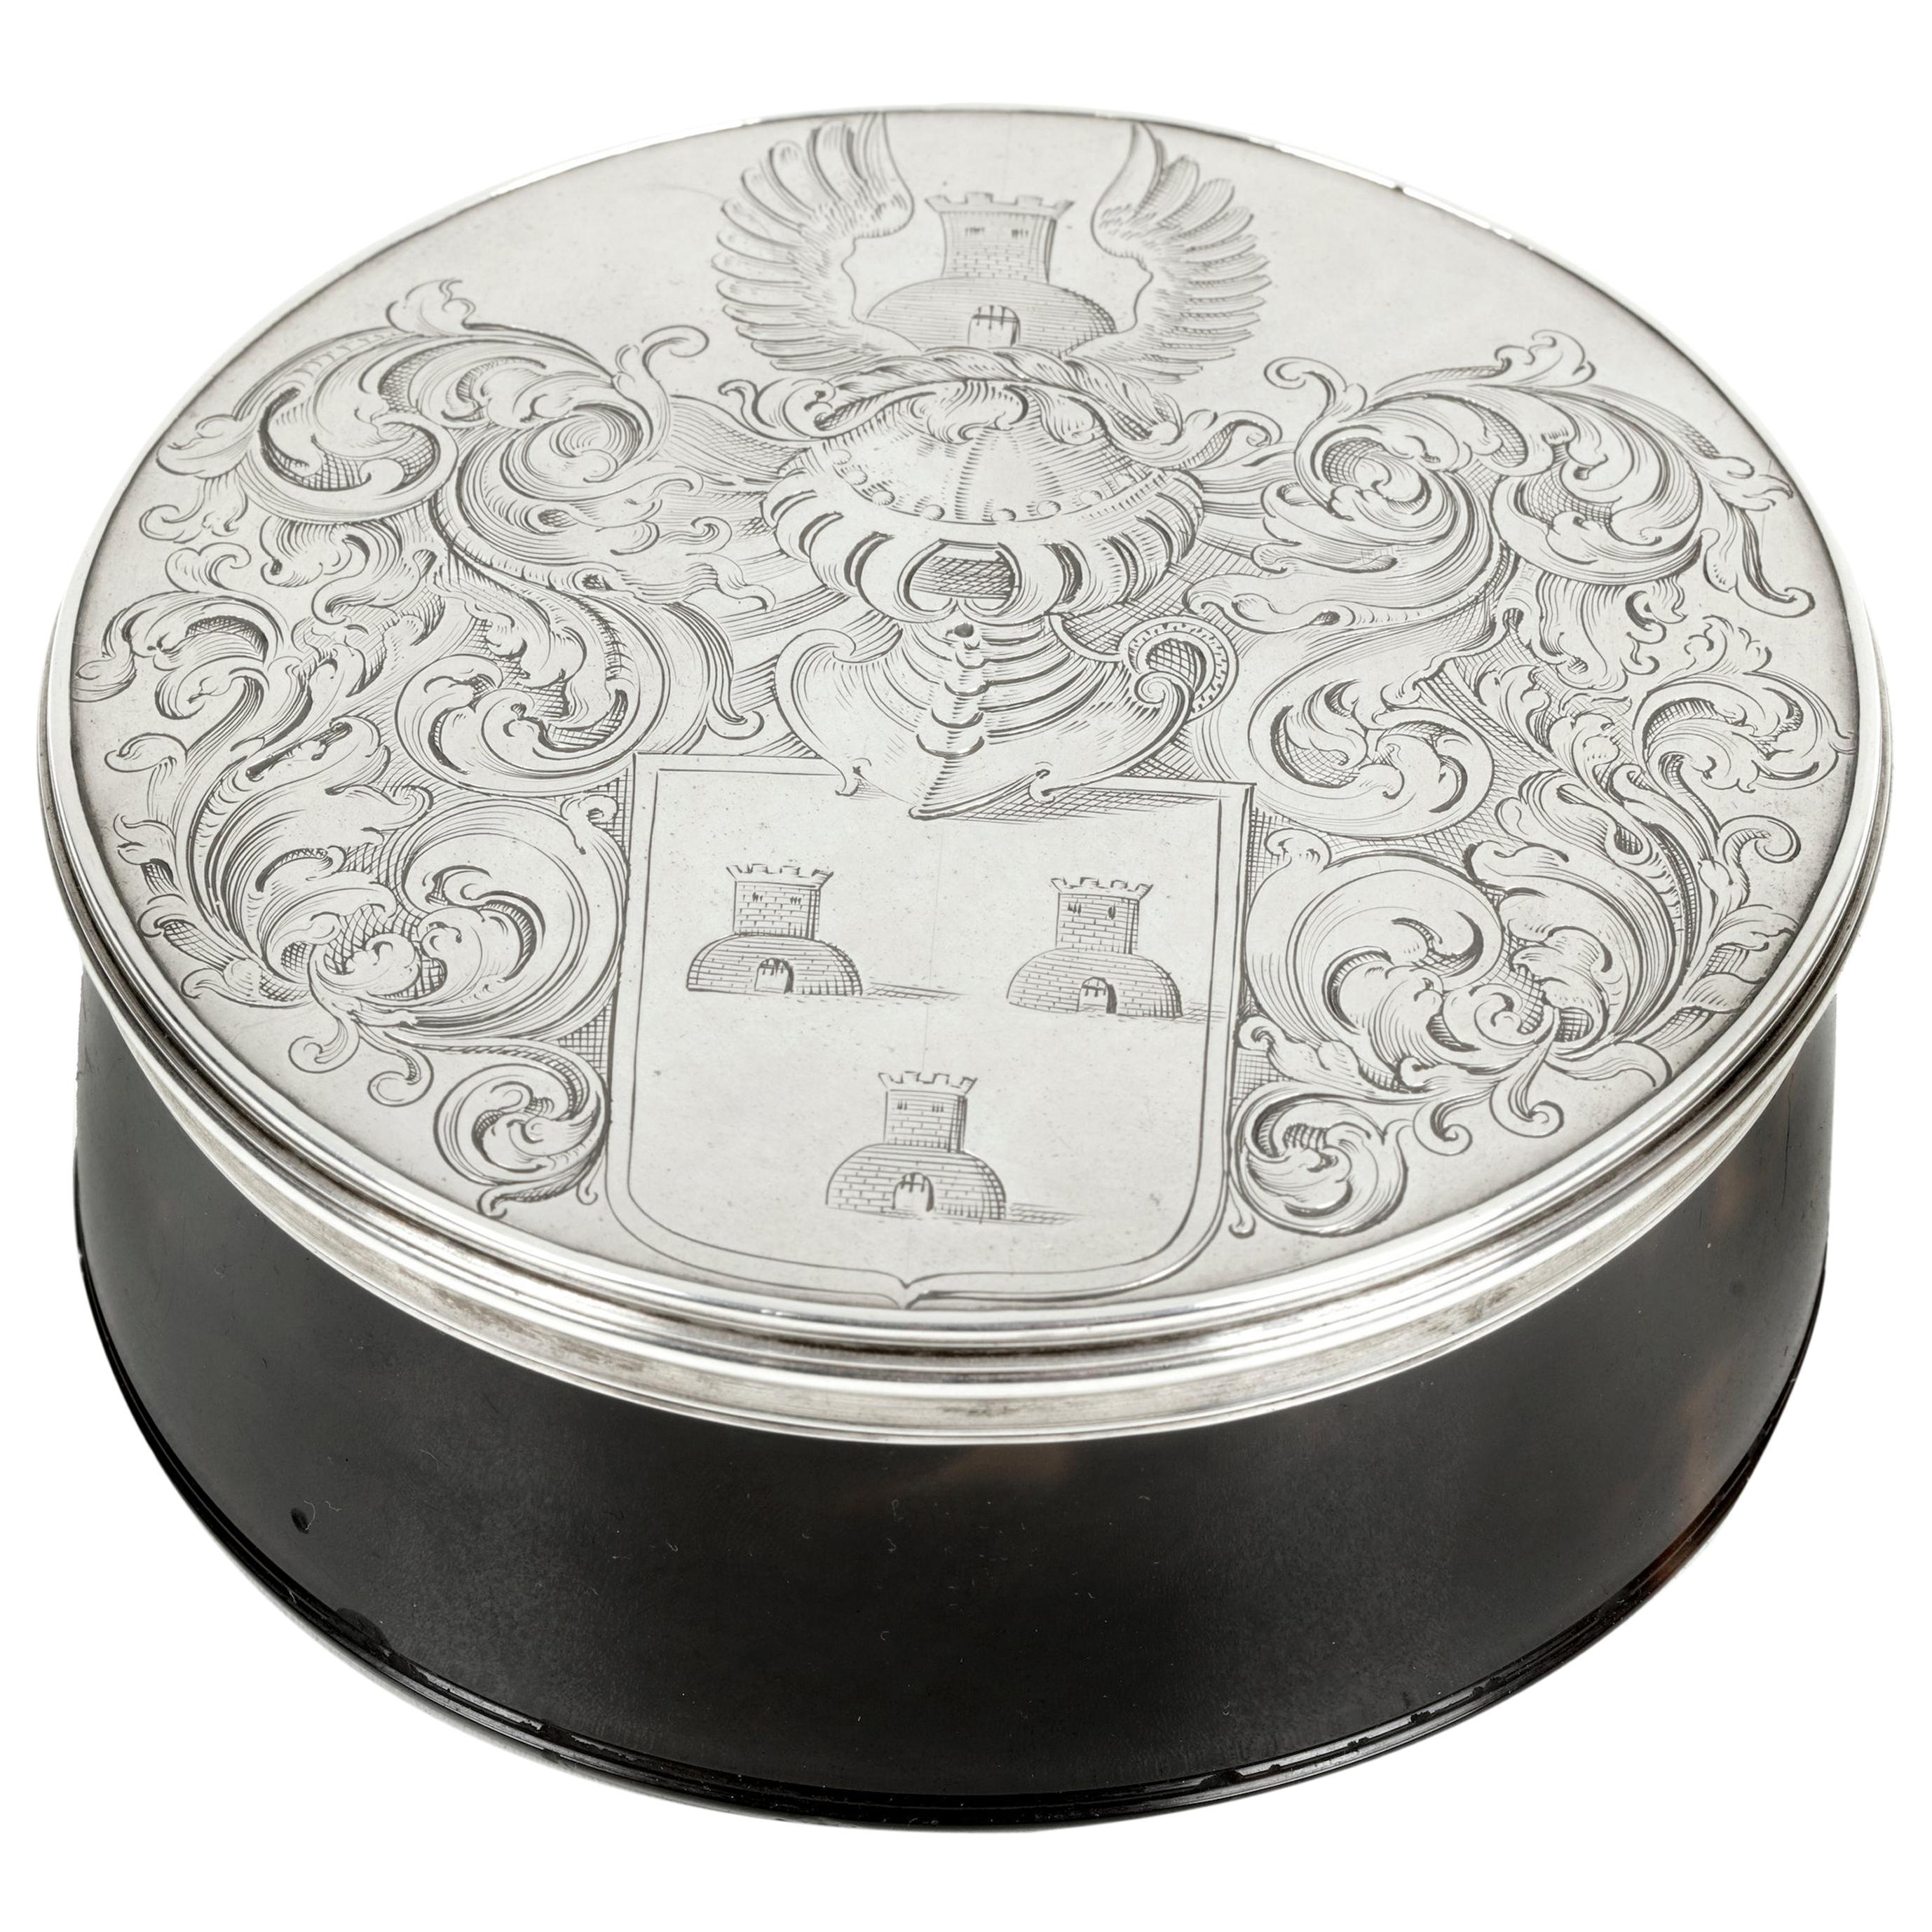 Fine 17th Century Dutch Colonial Armorial Tortoiseshell & Silver Box, Dated 1691